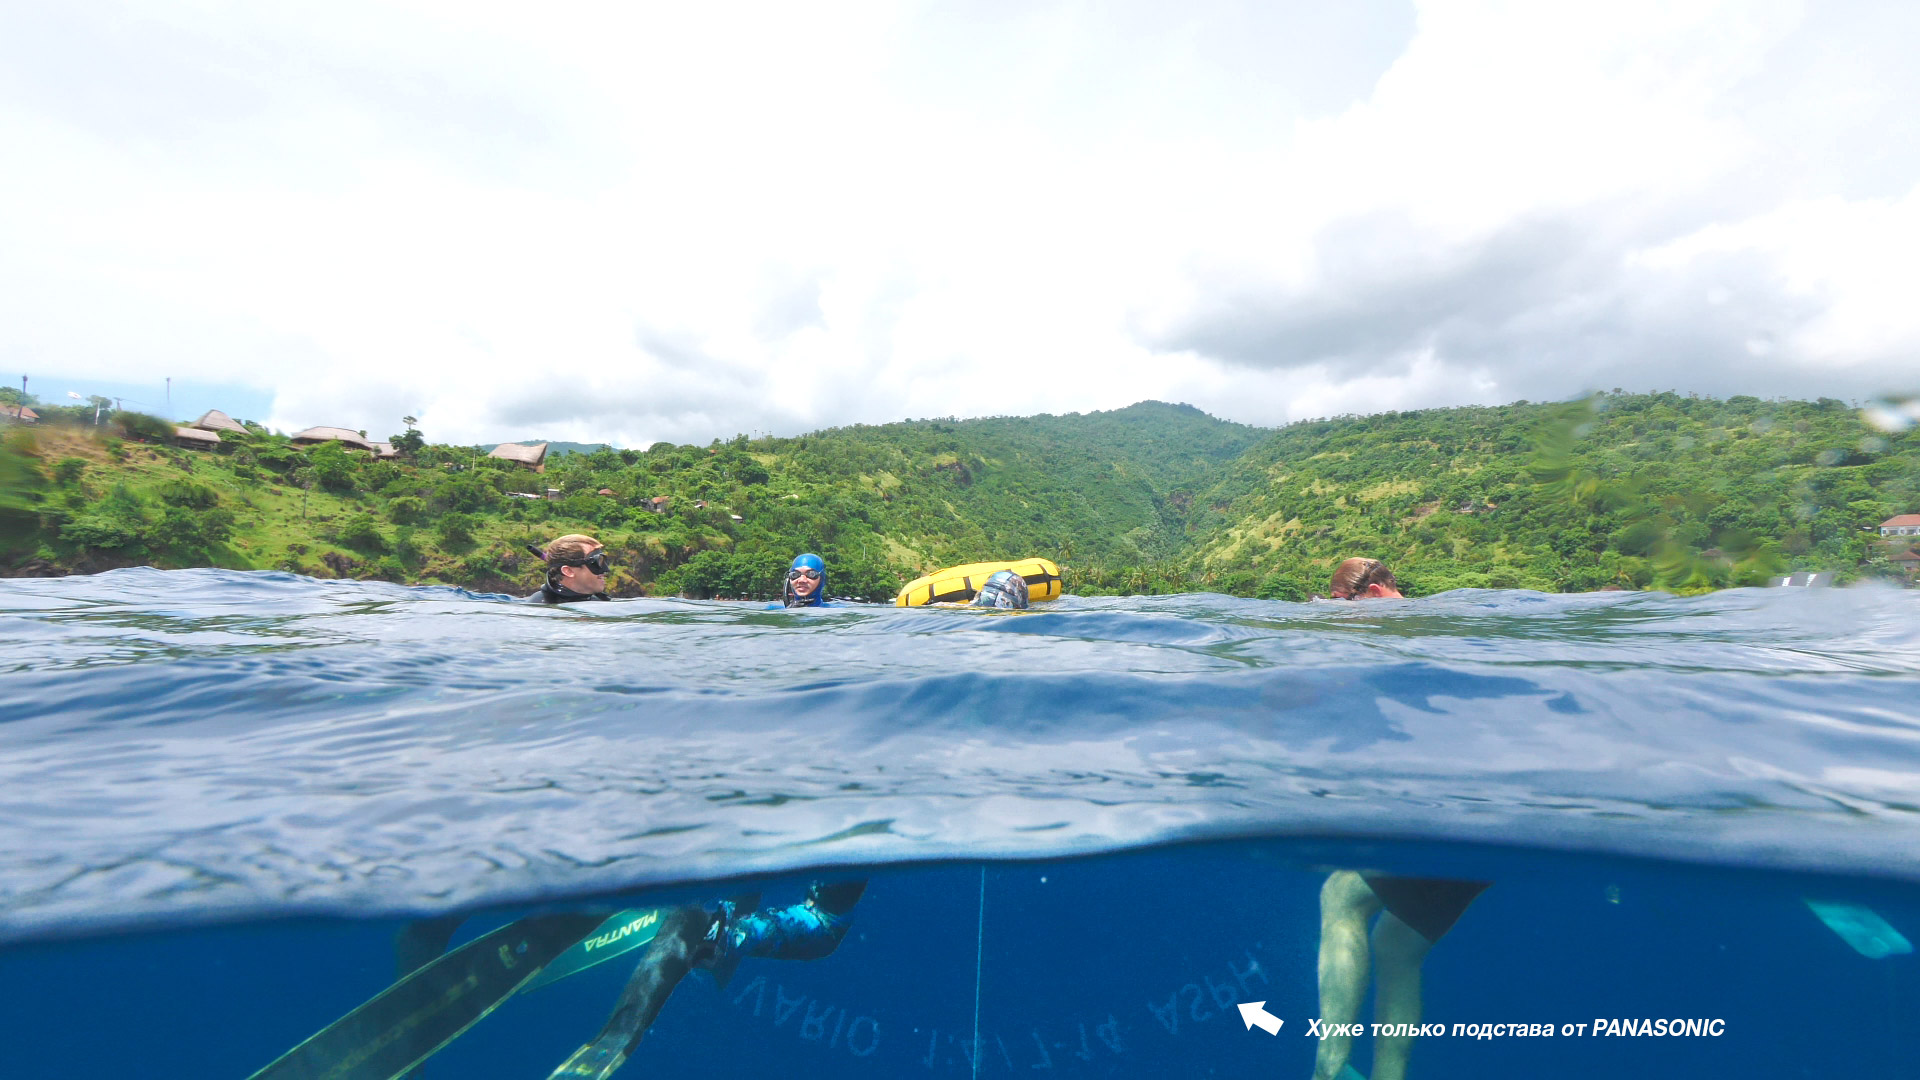 Panasonic Lumix G Vario 7-14mm f/4 ASPH. Lens  for underwater photo/video